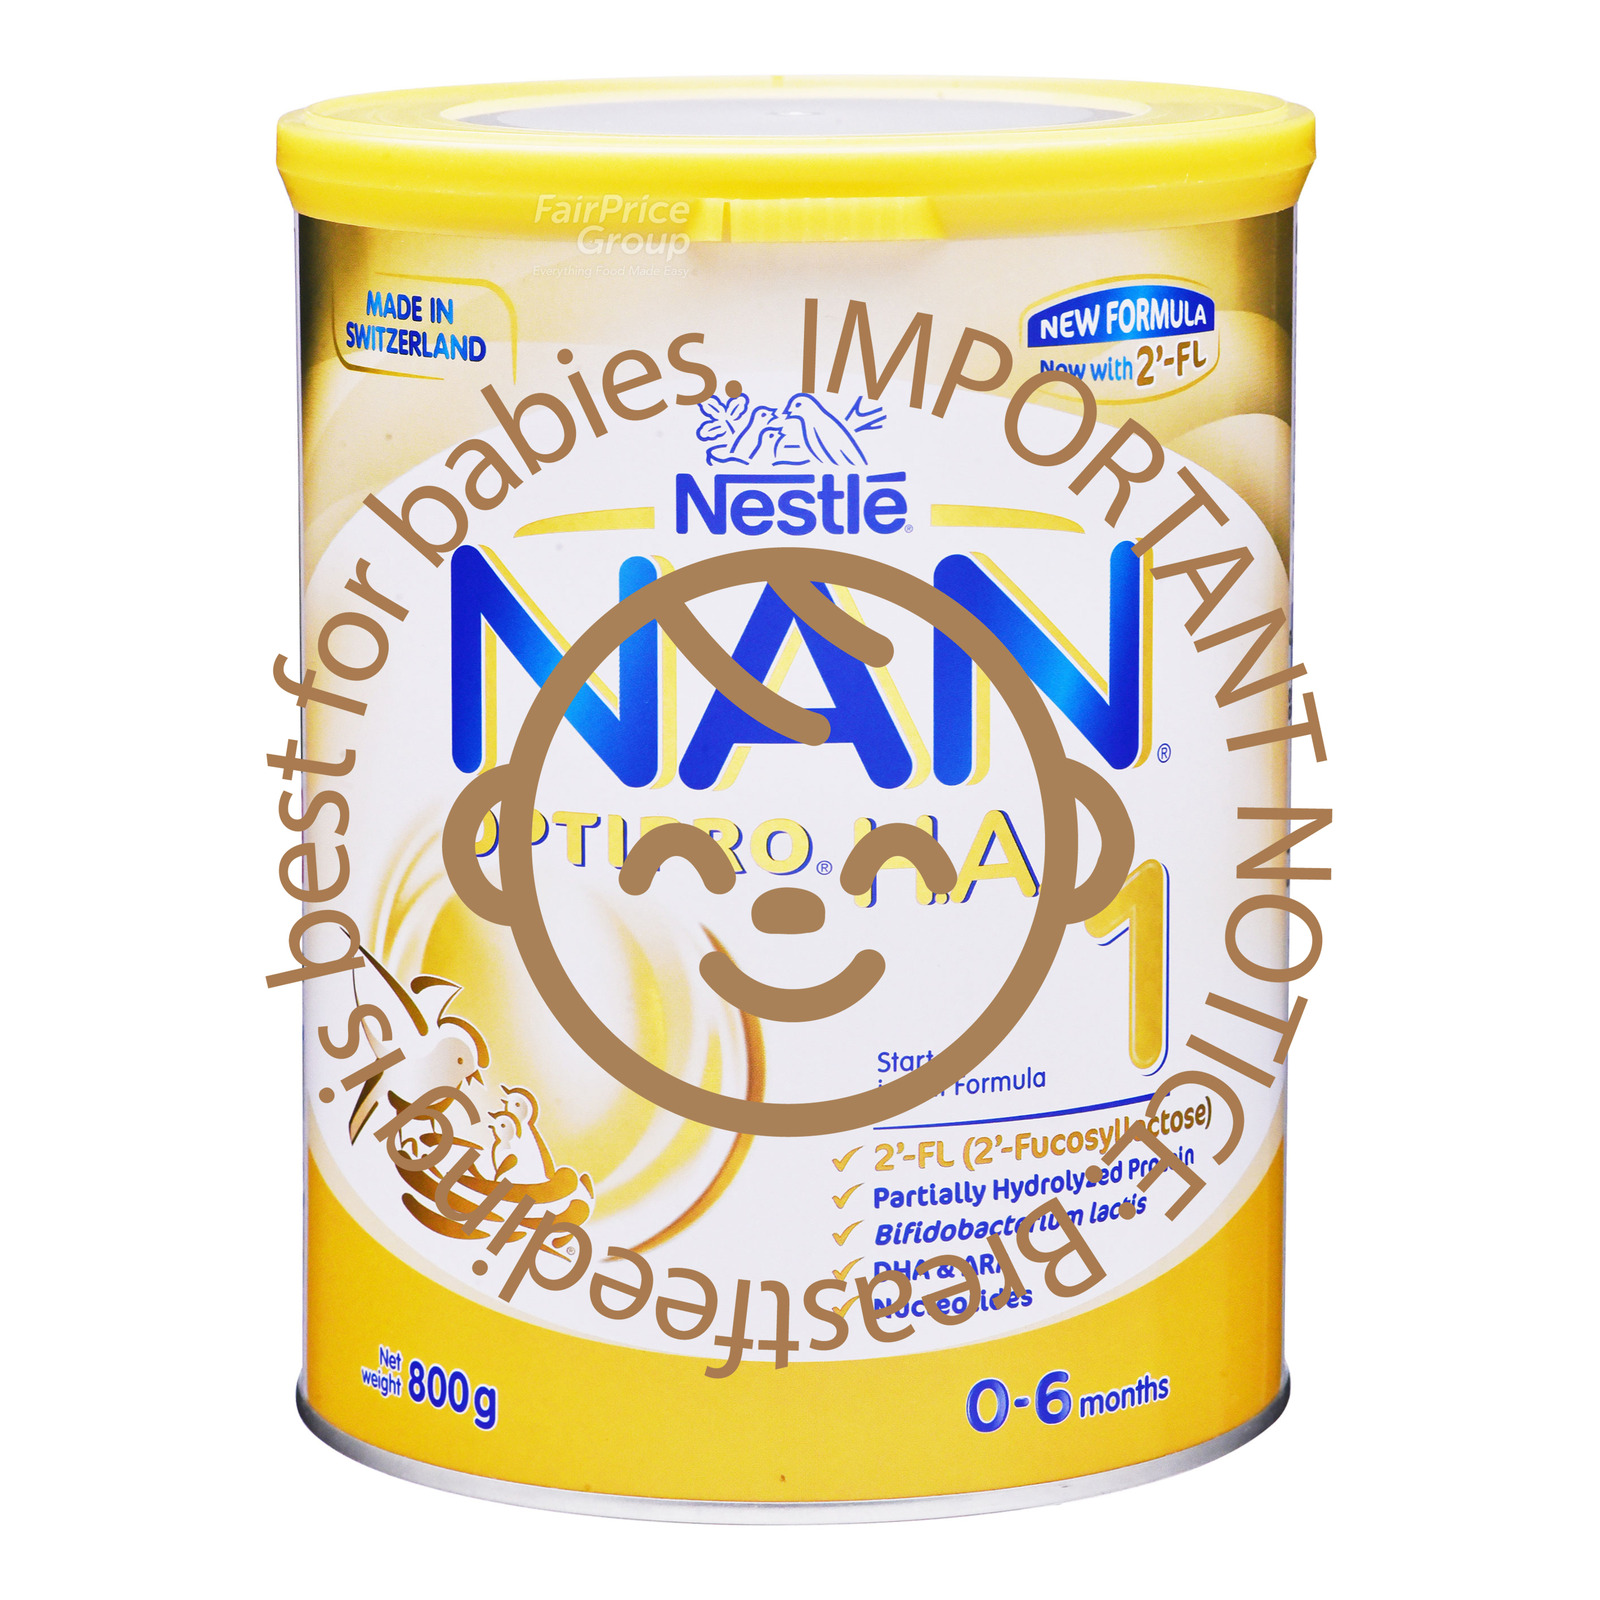 Nestle Nan Optipro HA Starter Formula 2'-FL - Stage 1